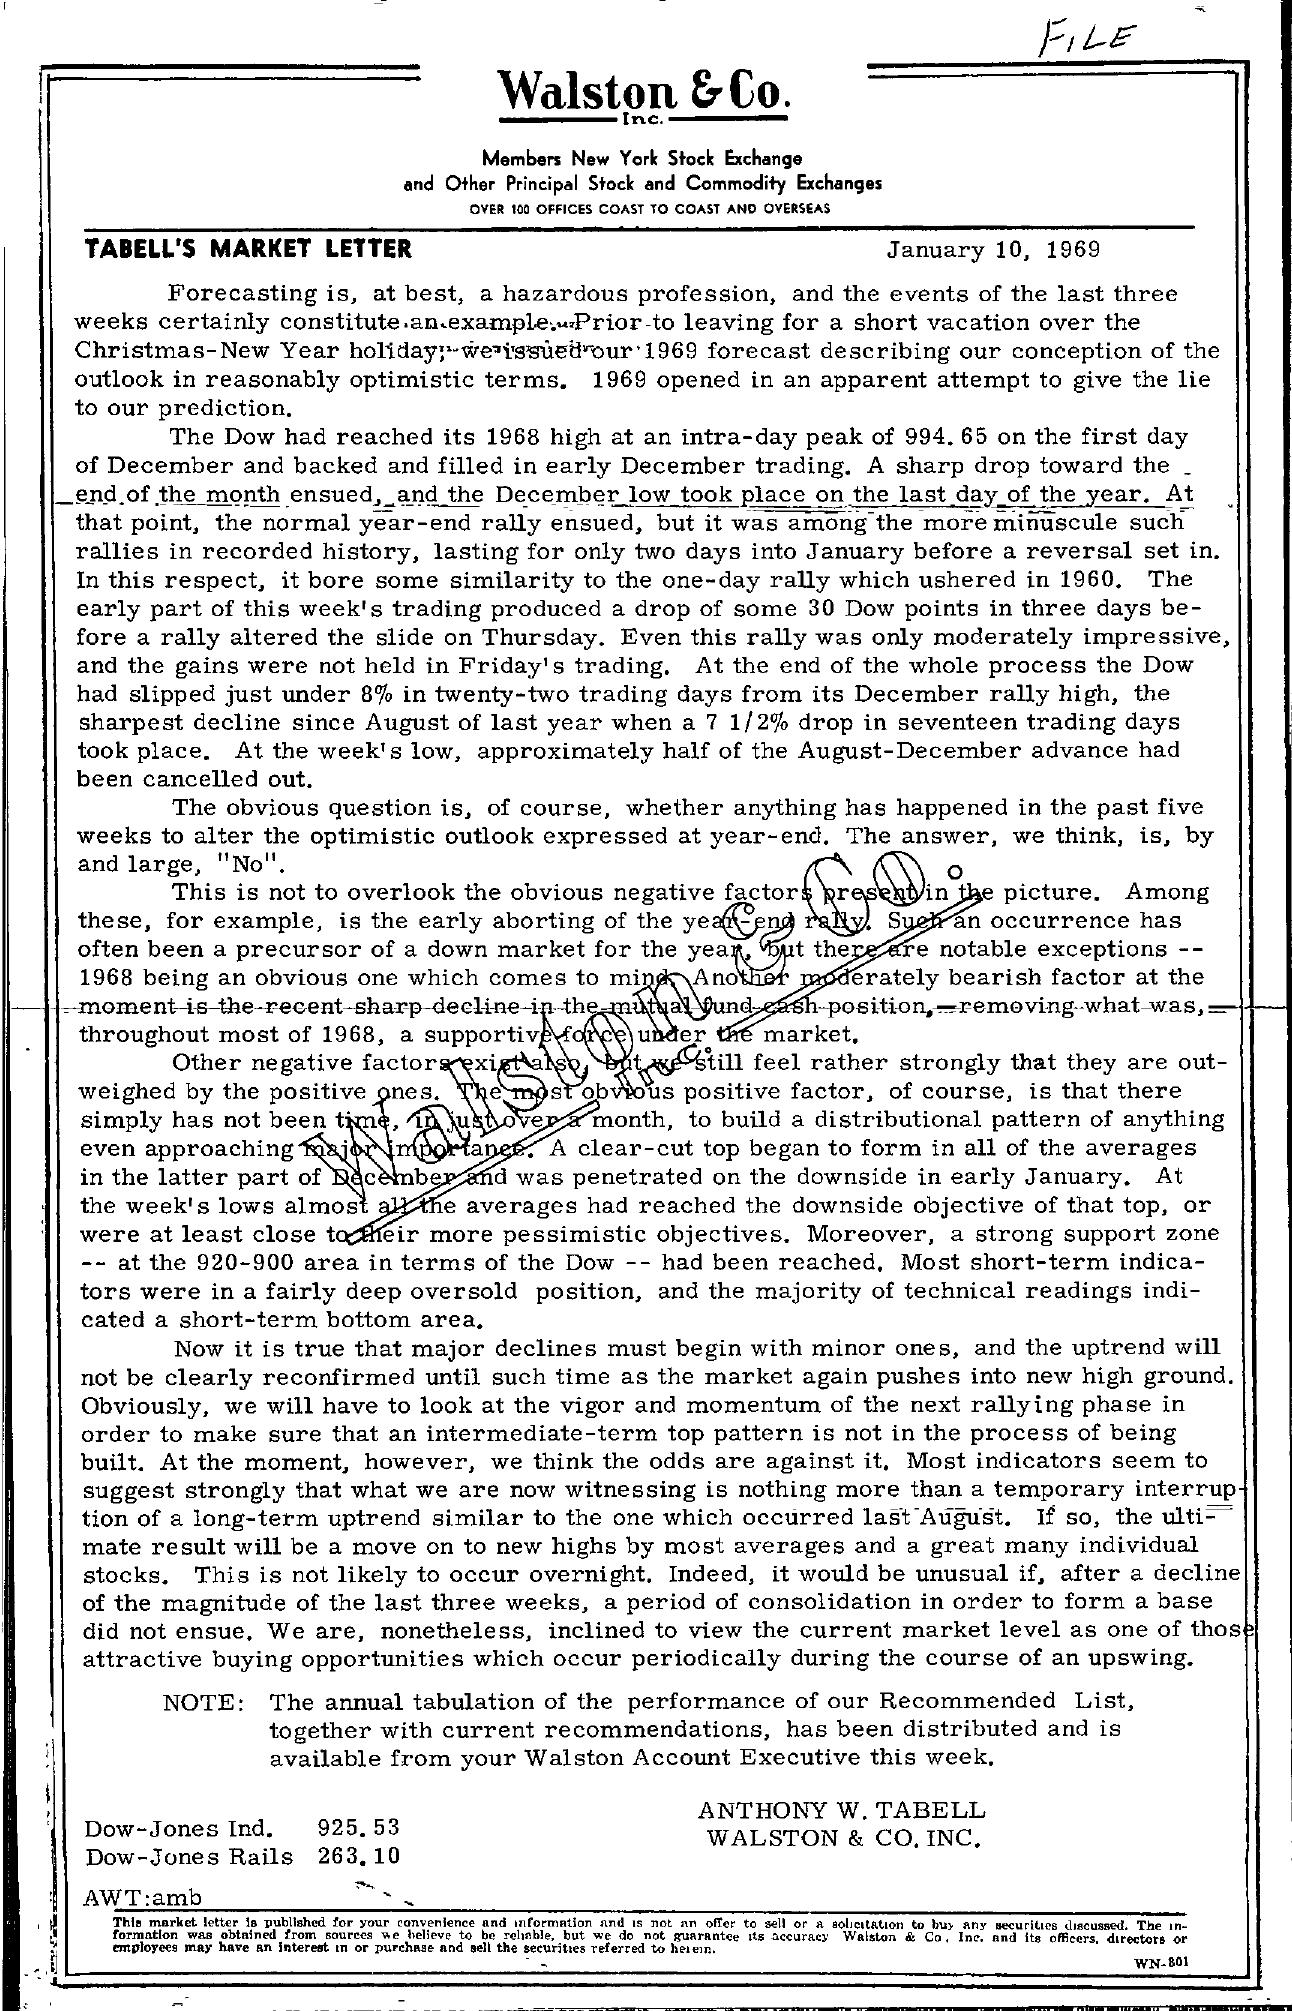 Tabell's Market Letter - January 10, 1969